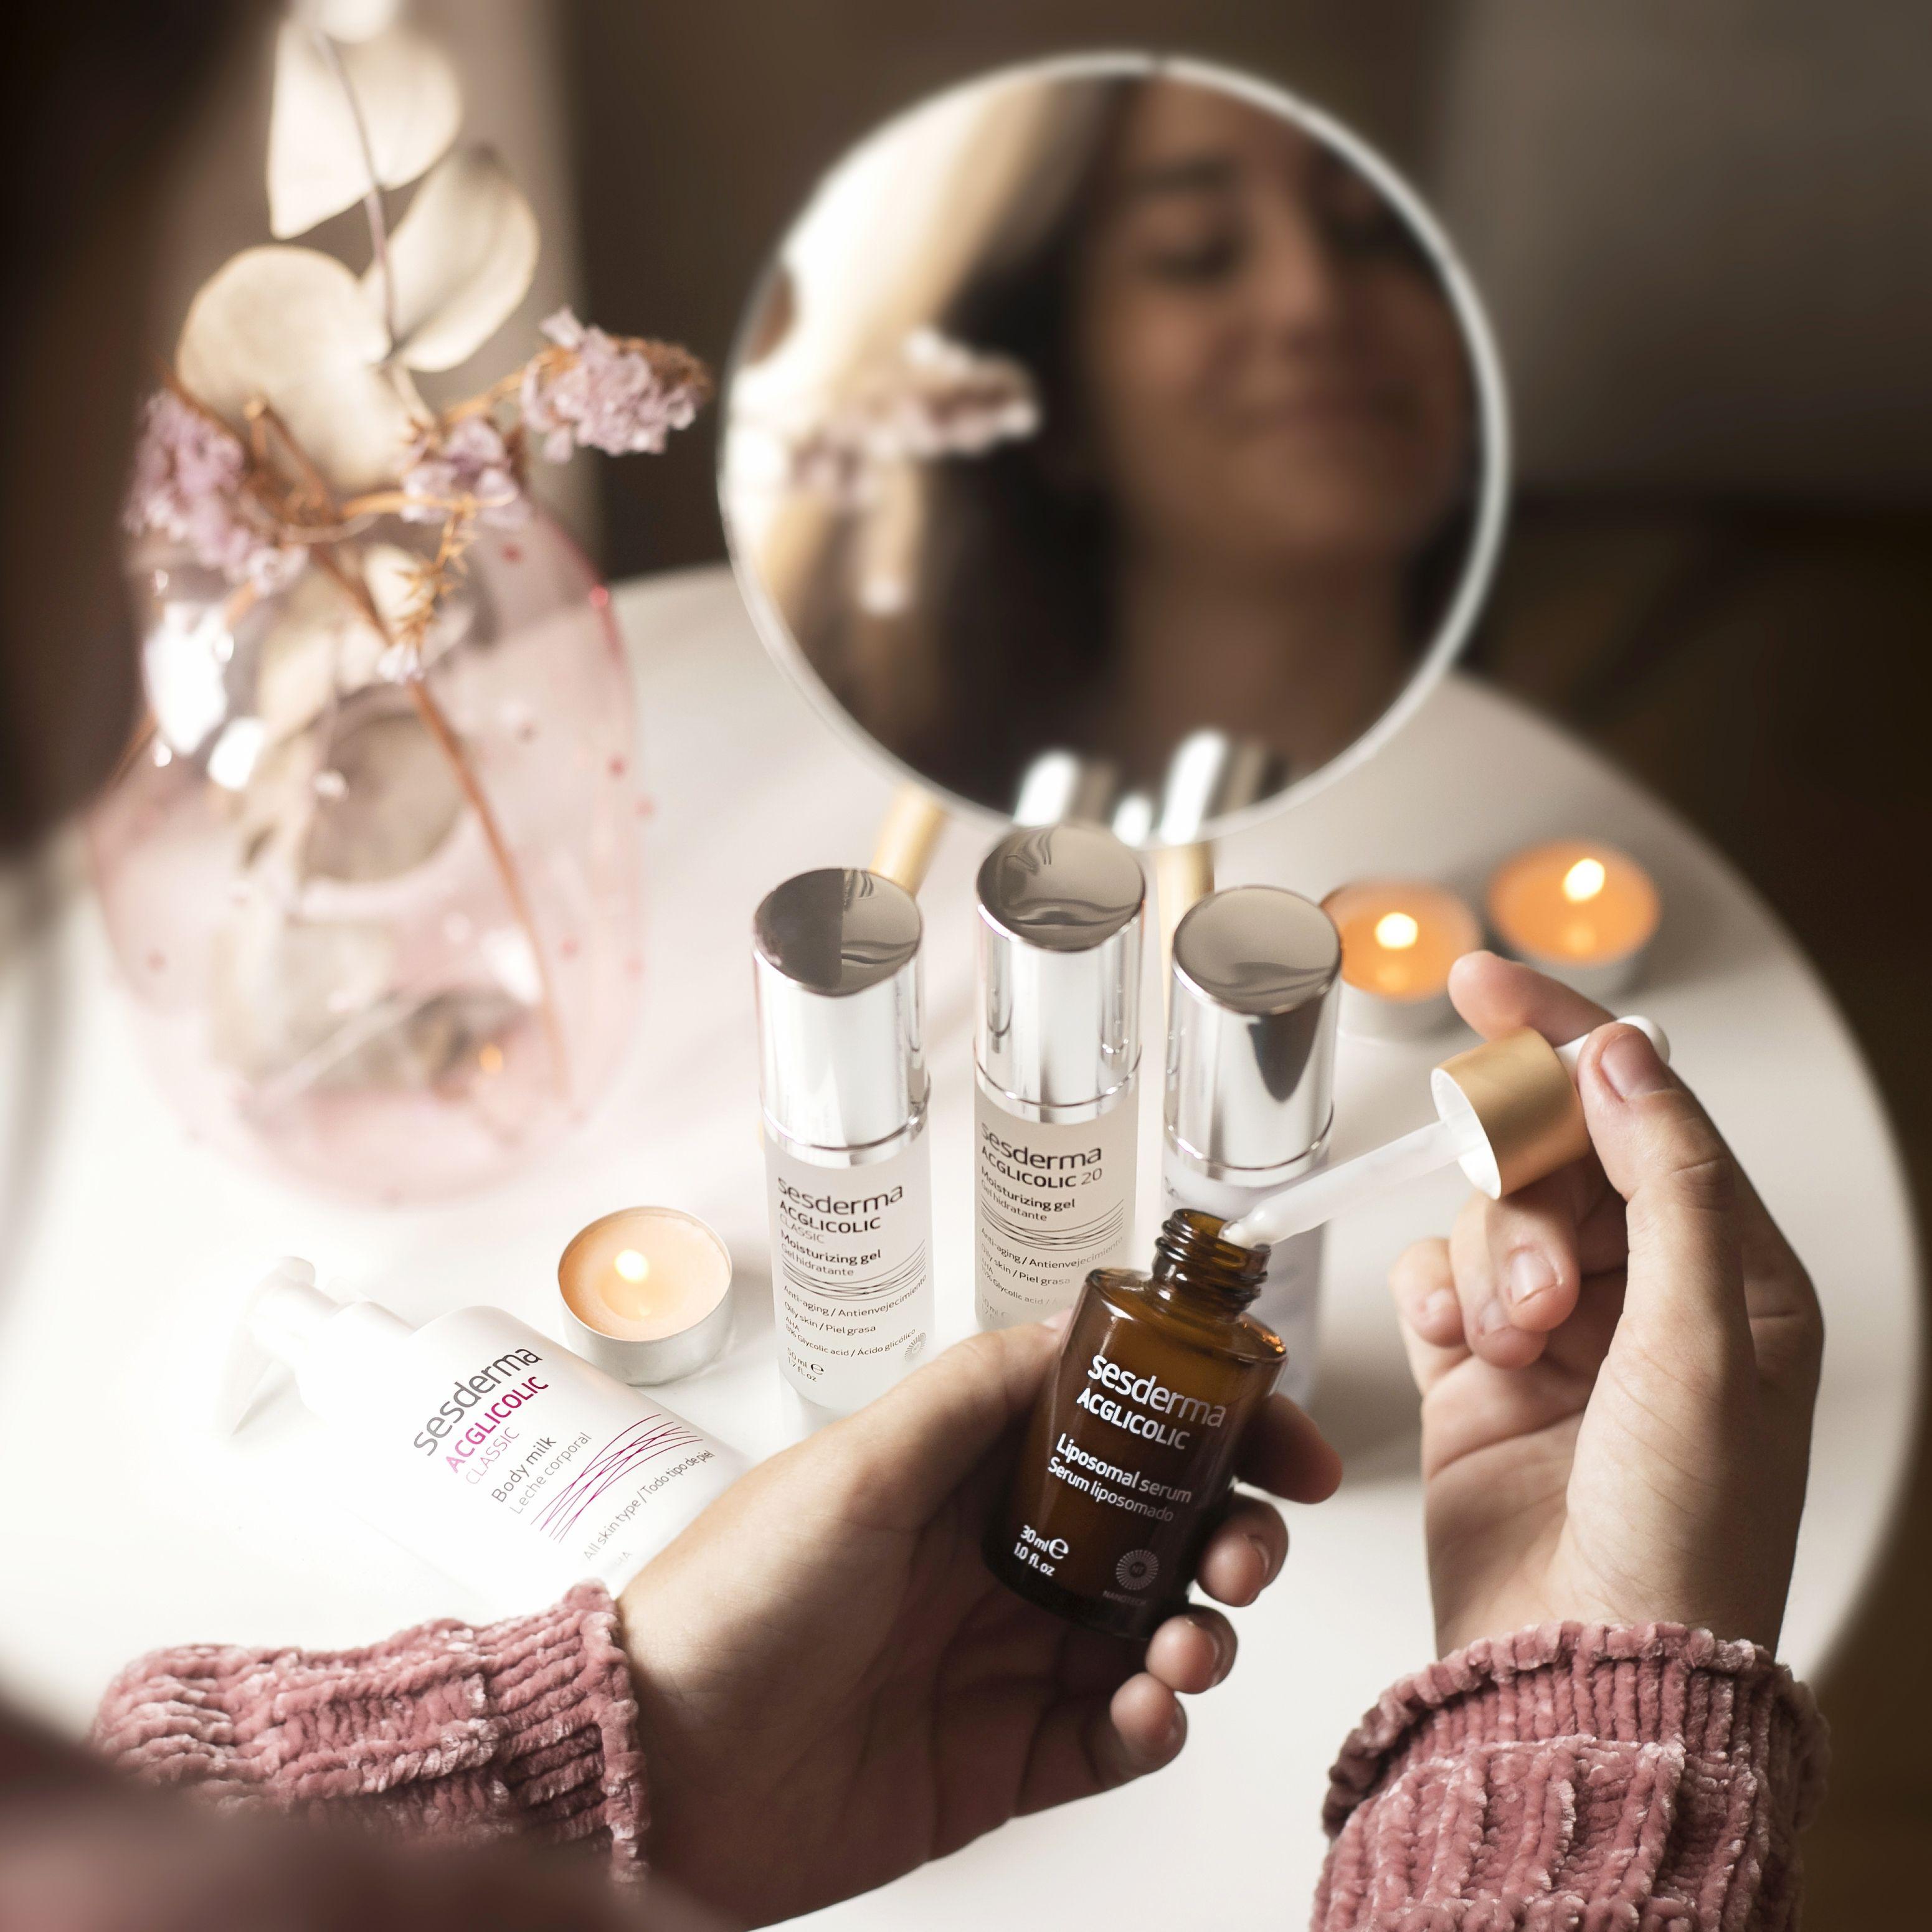 ACGLICOLIC | Sesderma, Marcas de acné, Crema corporal